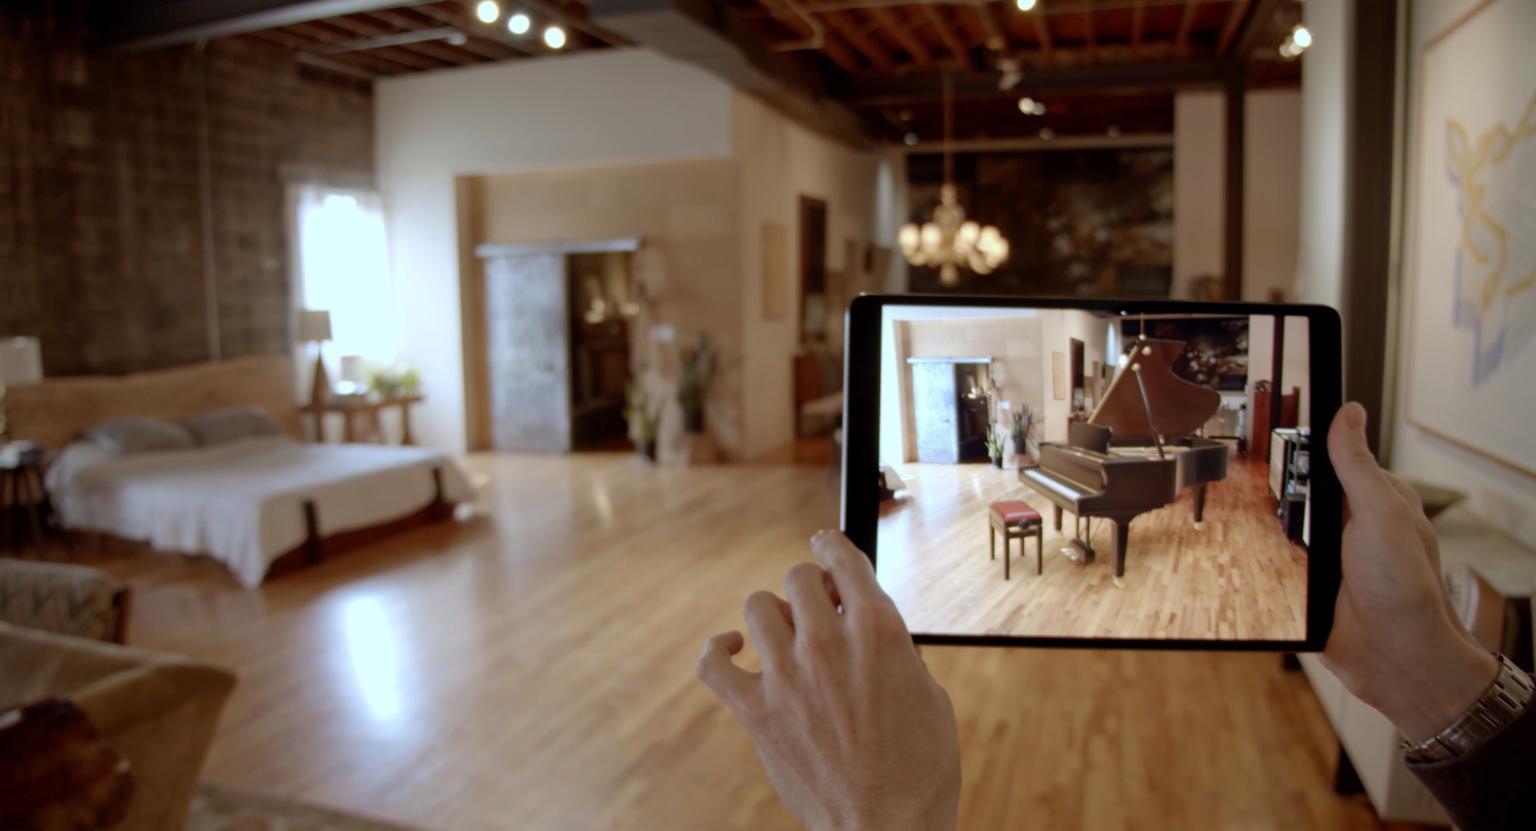 Web-Based Augmented Reality